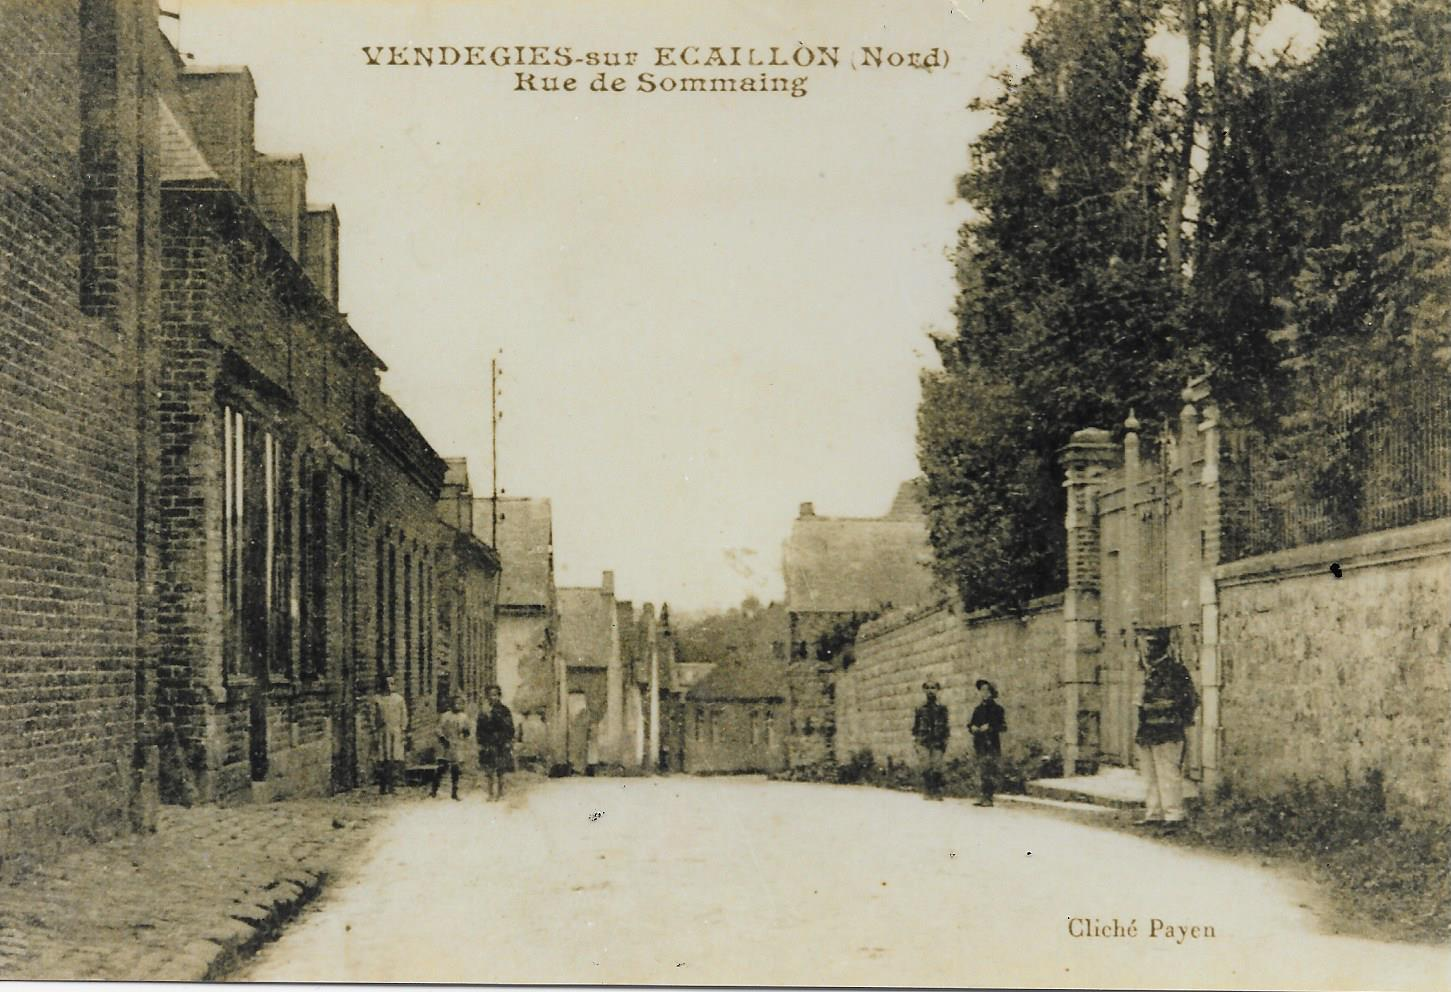 Rue de sommaing